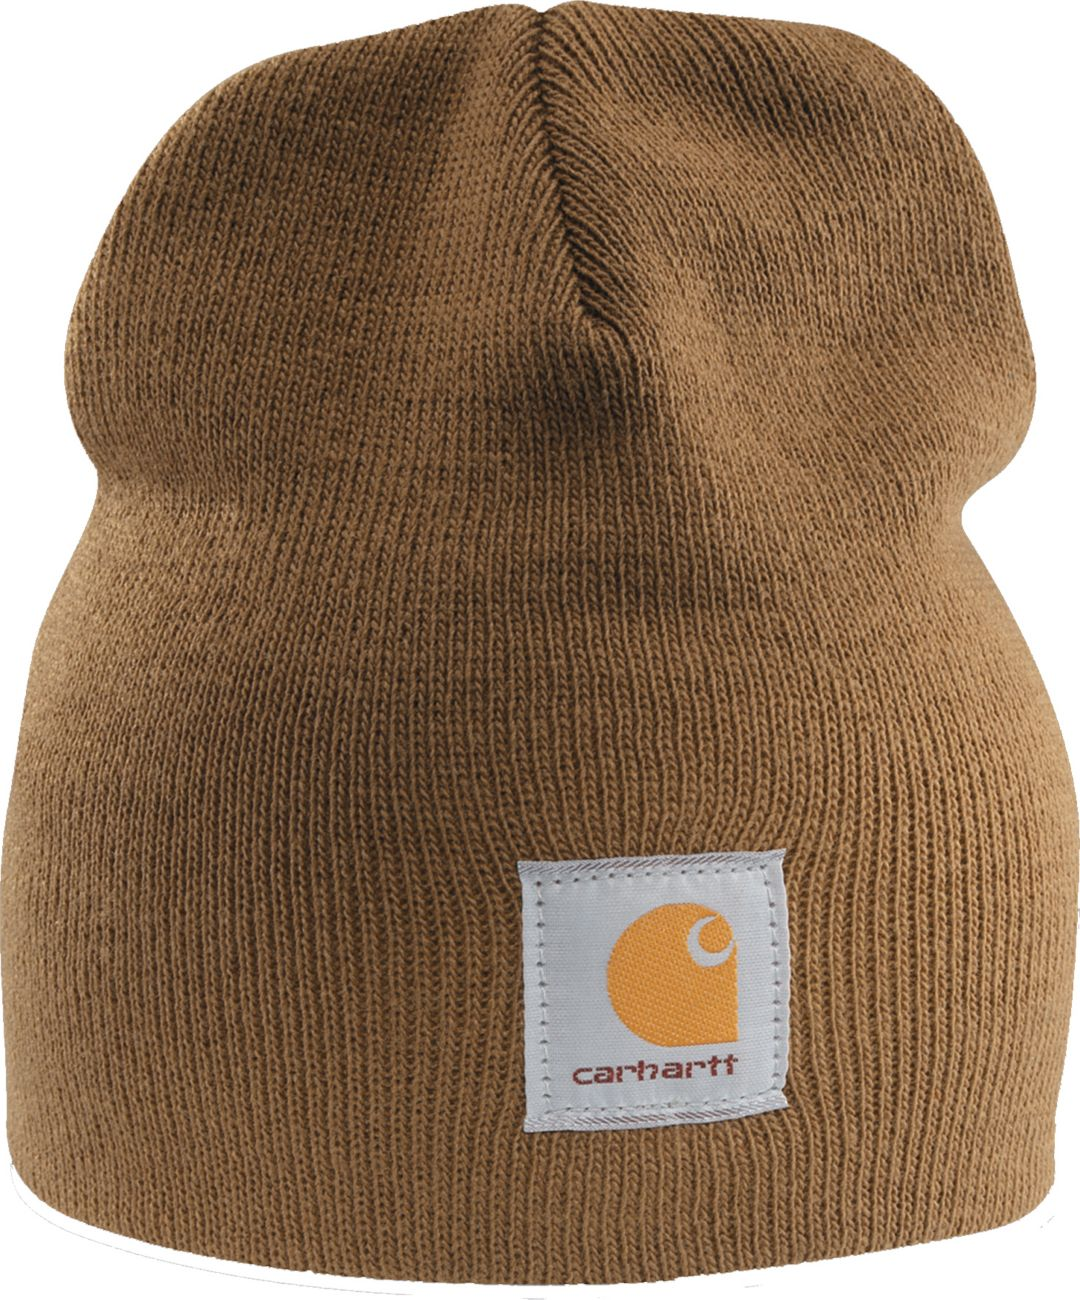 1c4f61f97534e Carhartt Men's Acrylic Knit Cap | DICK'S Sporting Goods